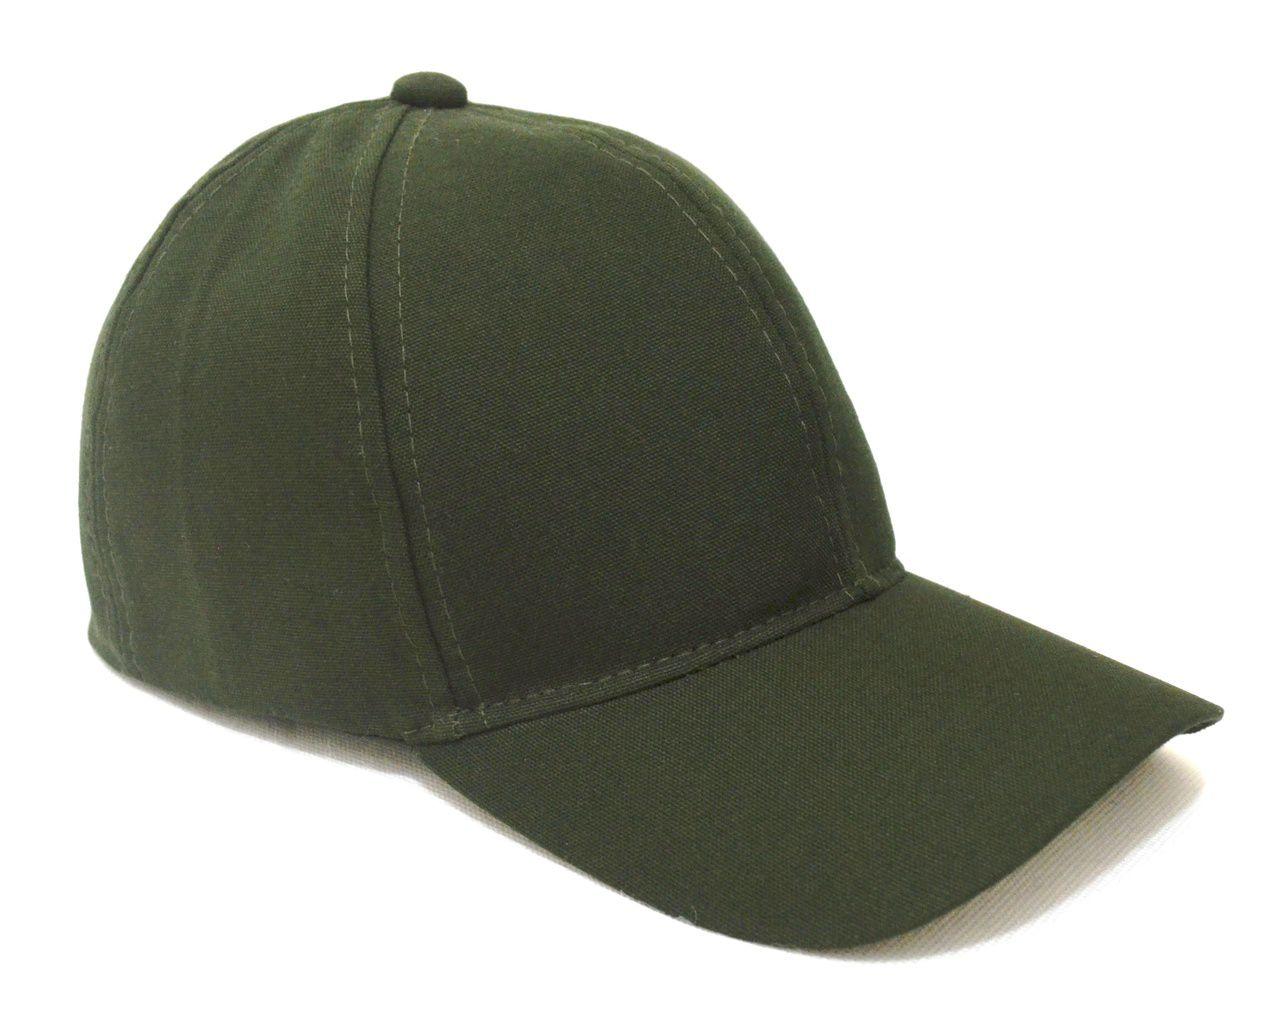 Kit 2 Bonés Verde Militar Liso Aba Curva Unissex Super Leve Top